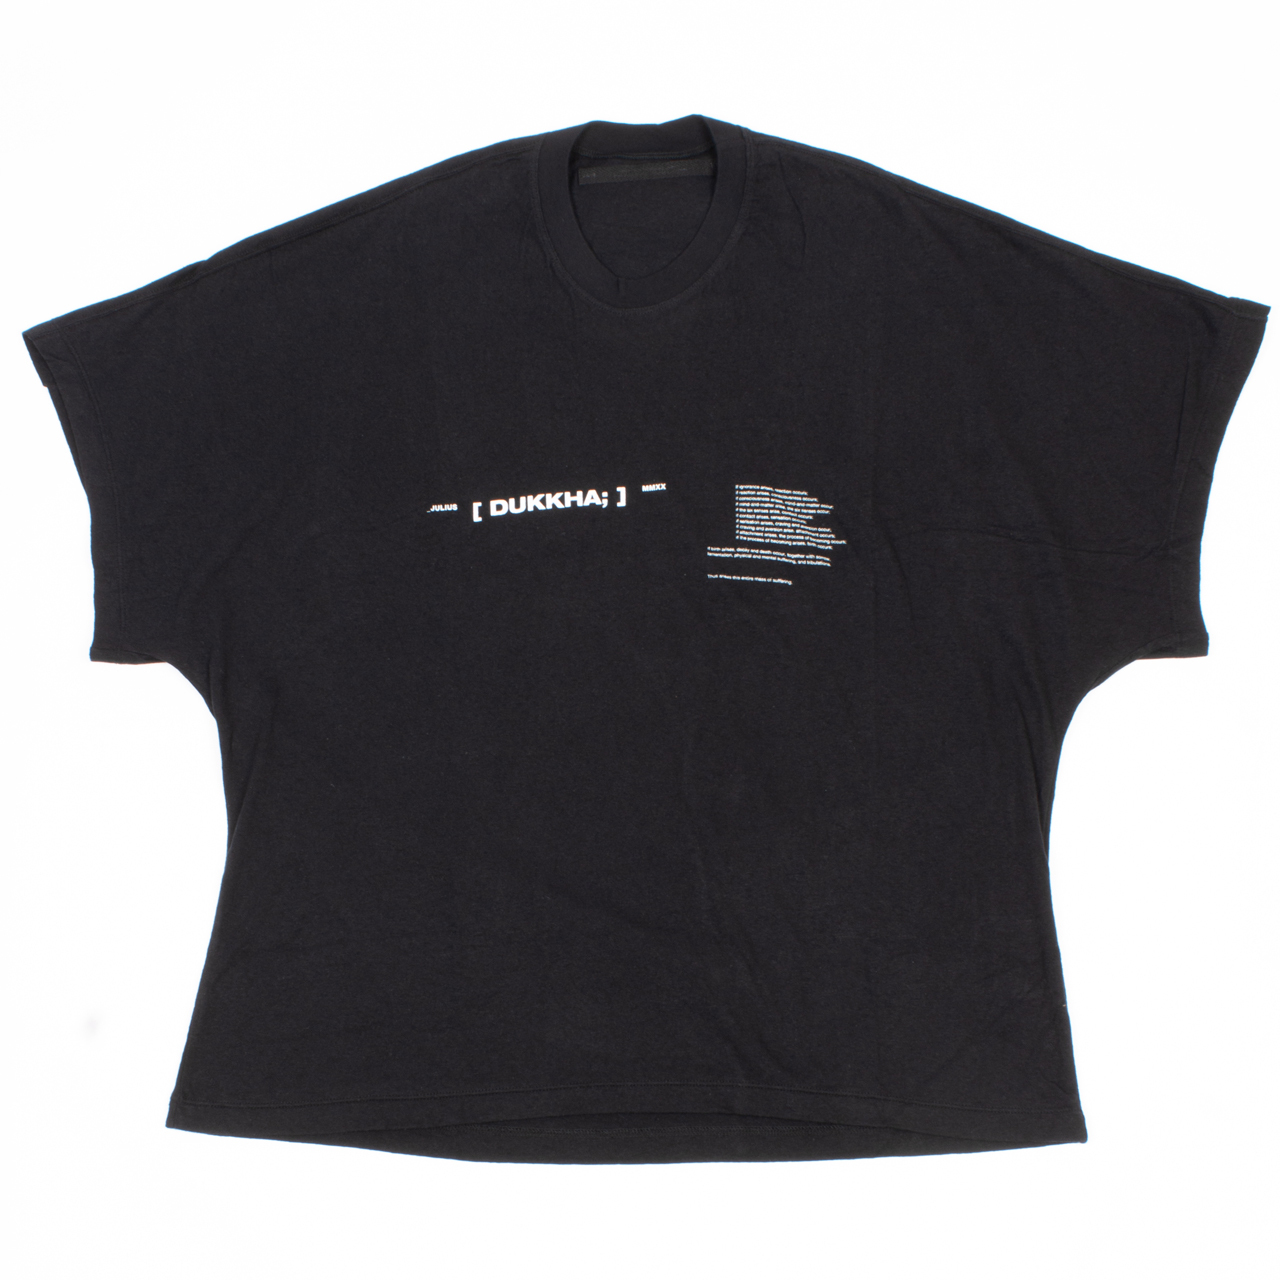 717CPM3-BLACK / ドルマンスリーブプリントTシャツ